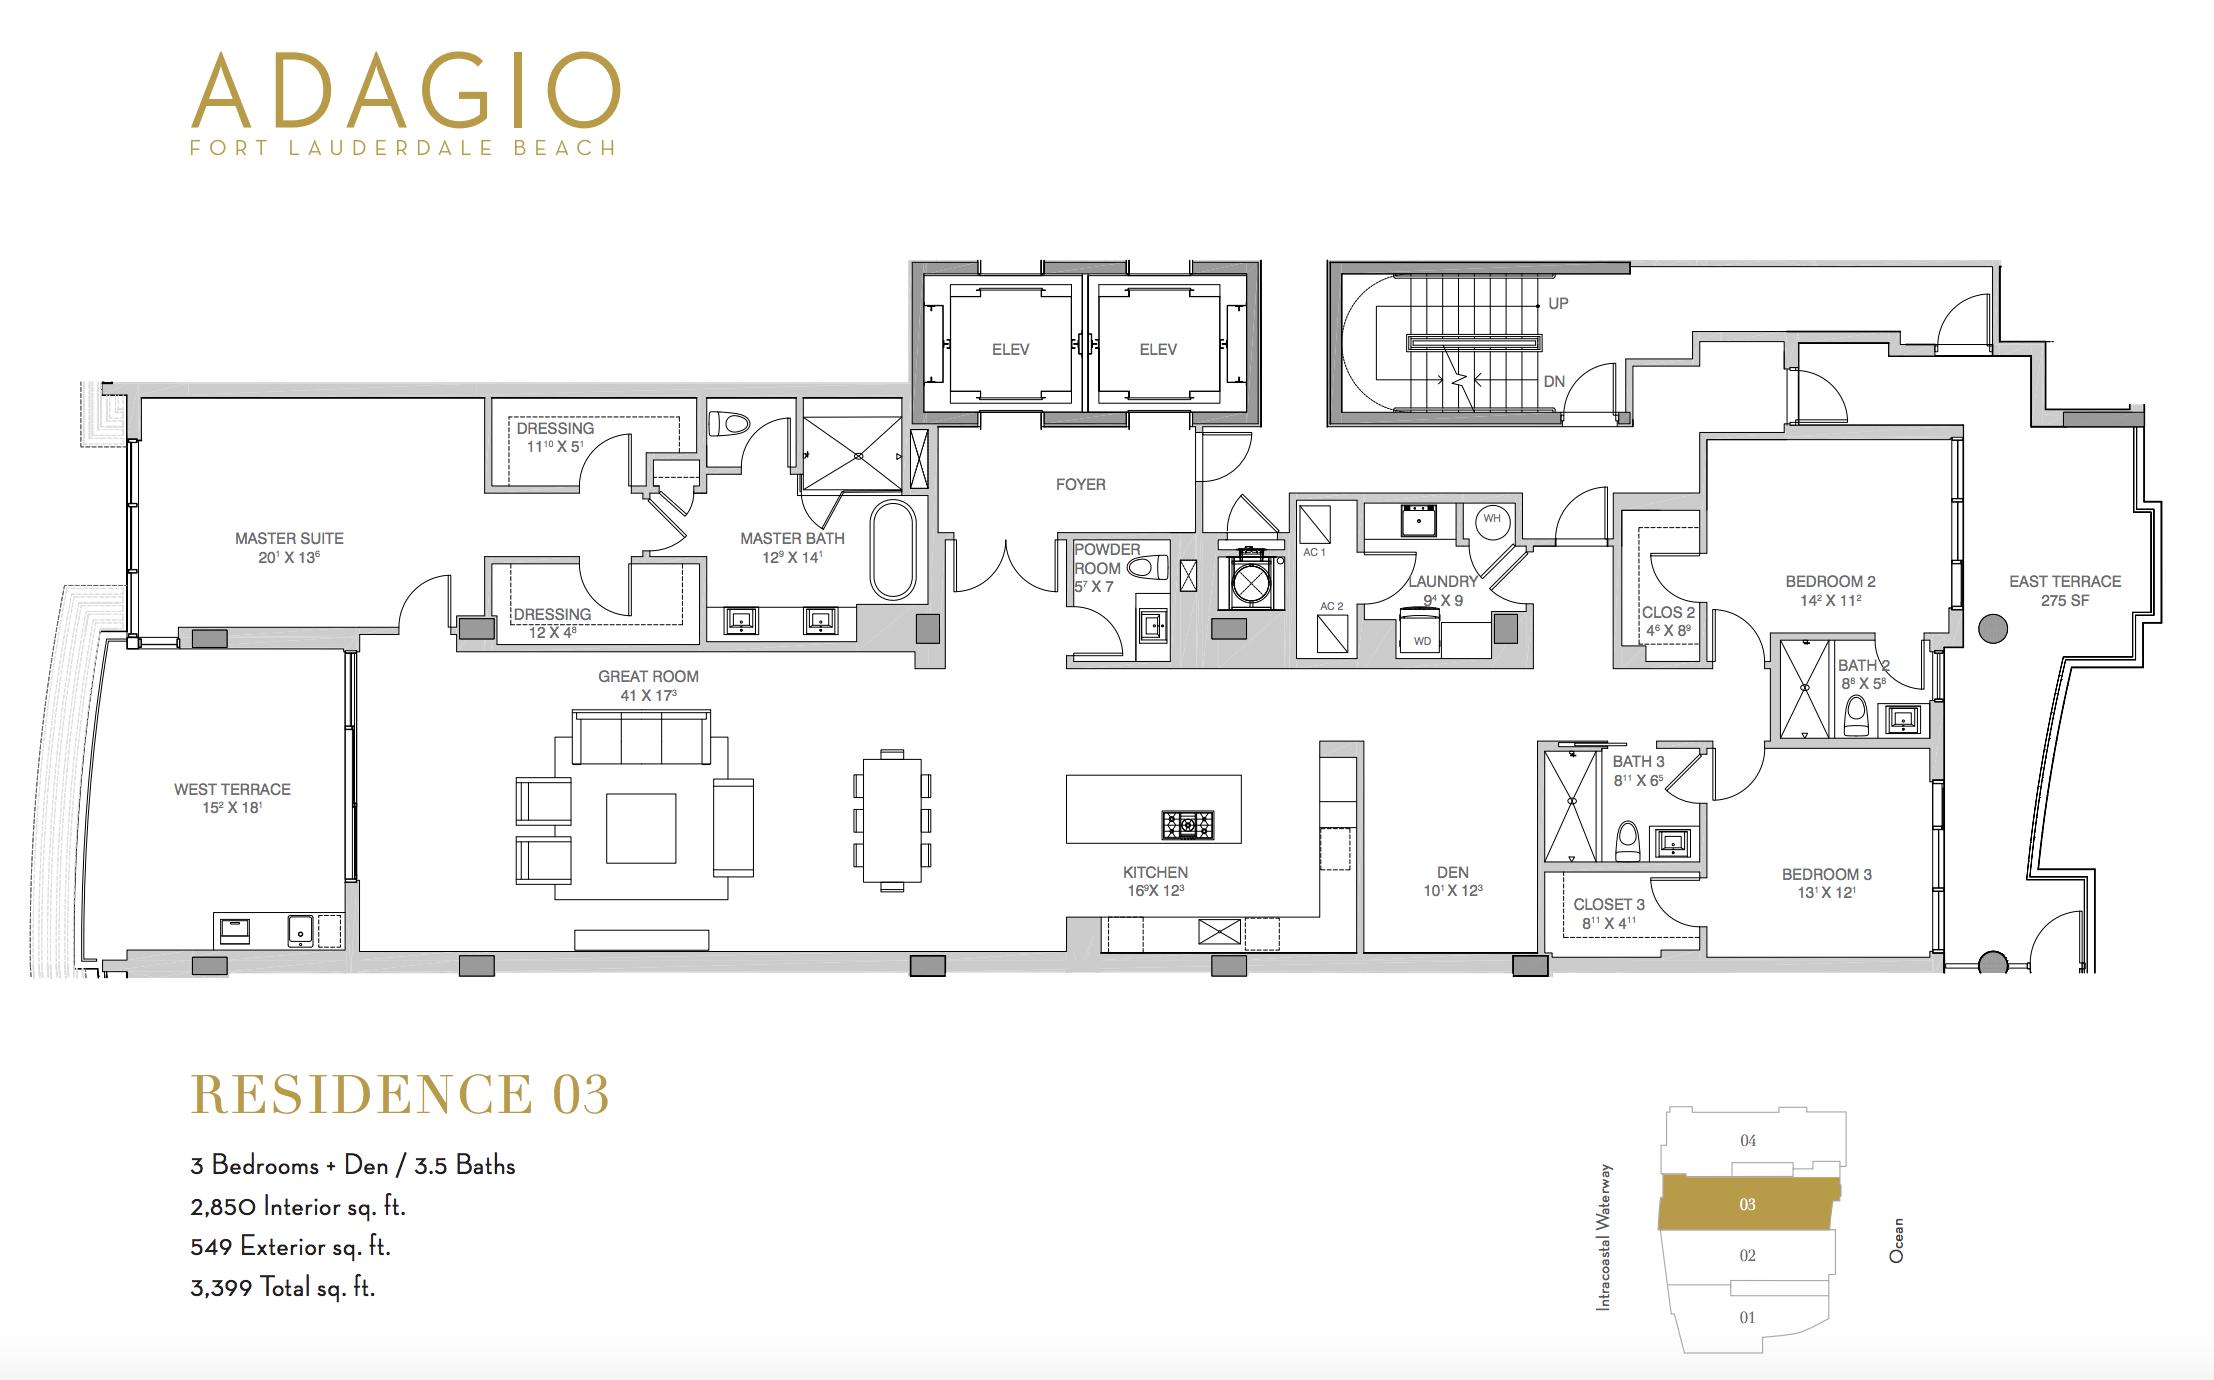 Adagio Fort Lauderdale | Residence 03